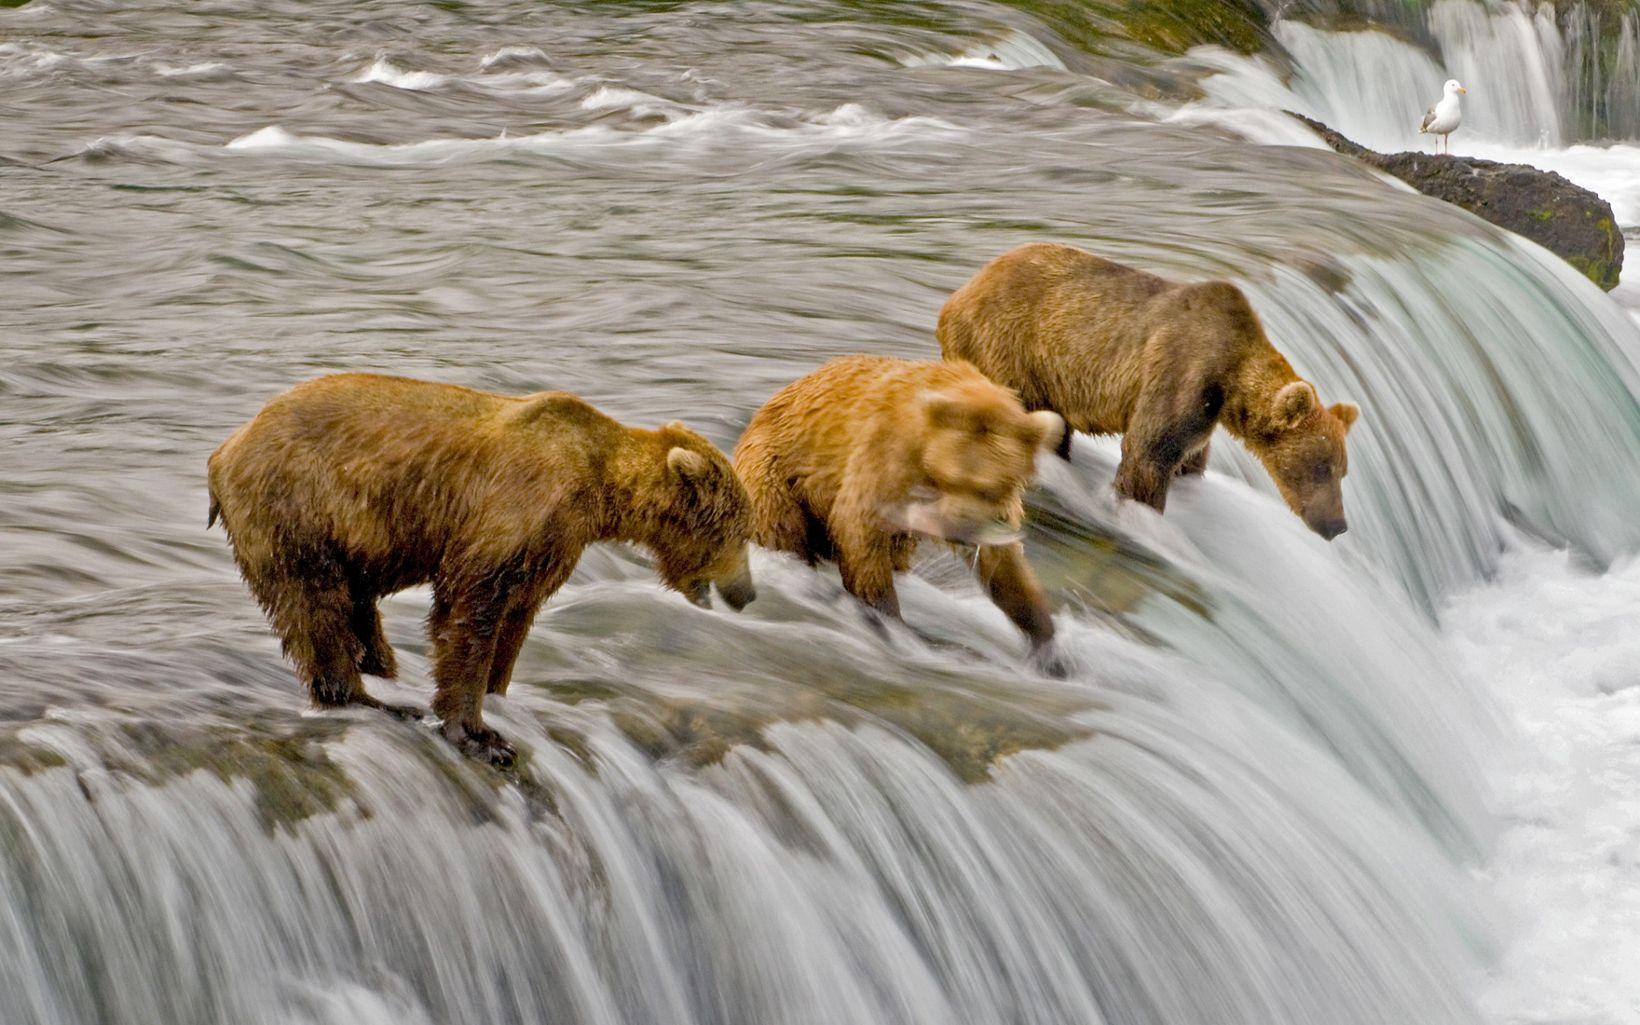 at Brooks Falls, Alaska.